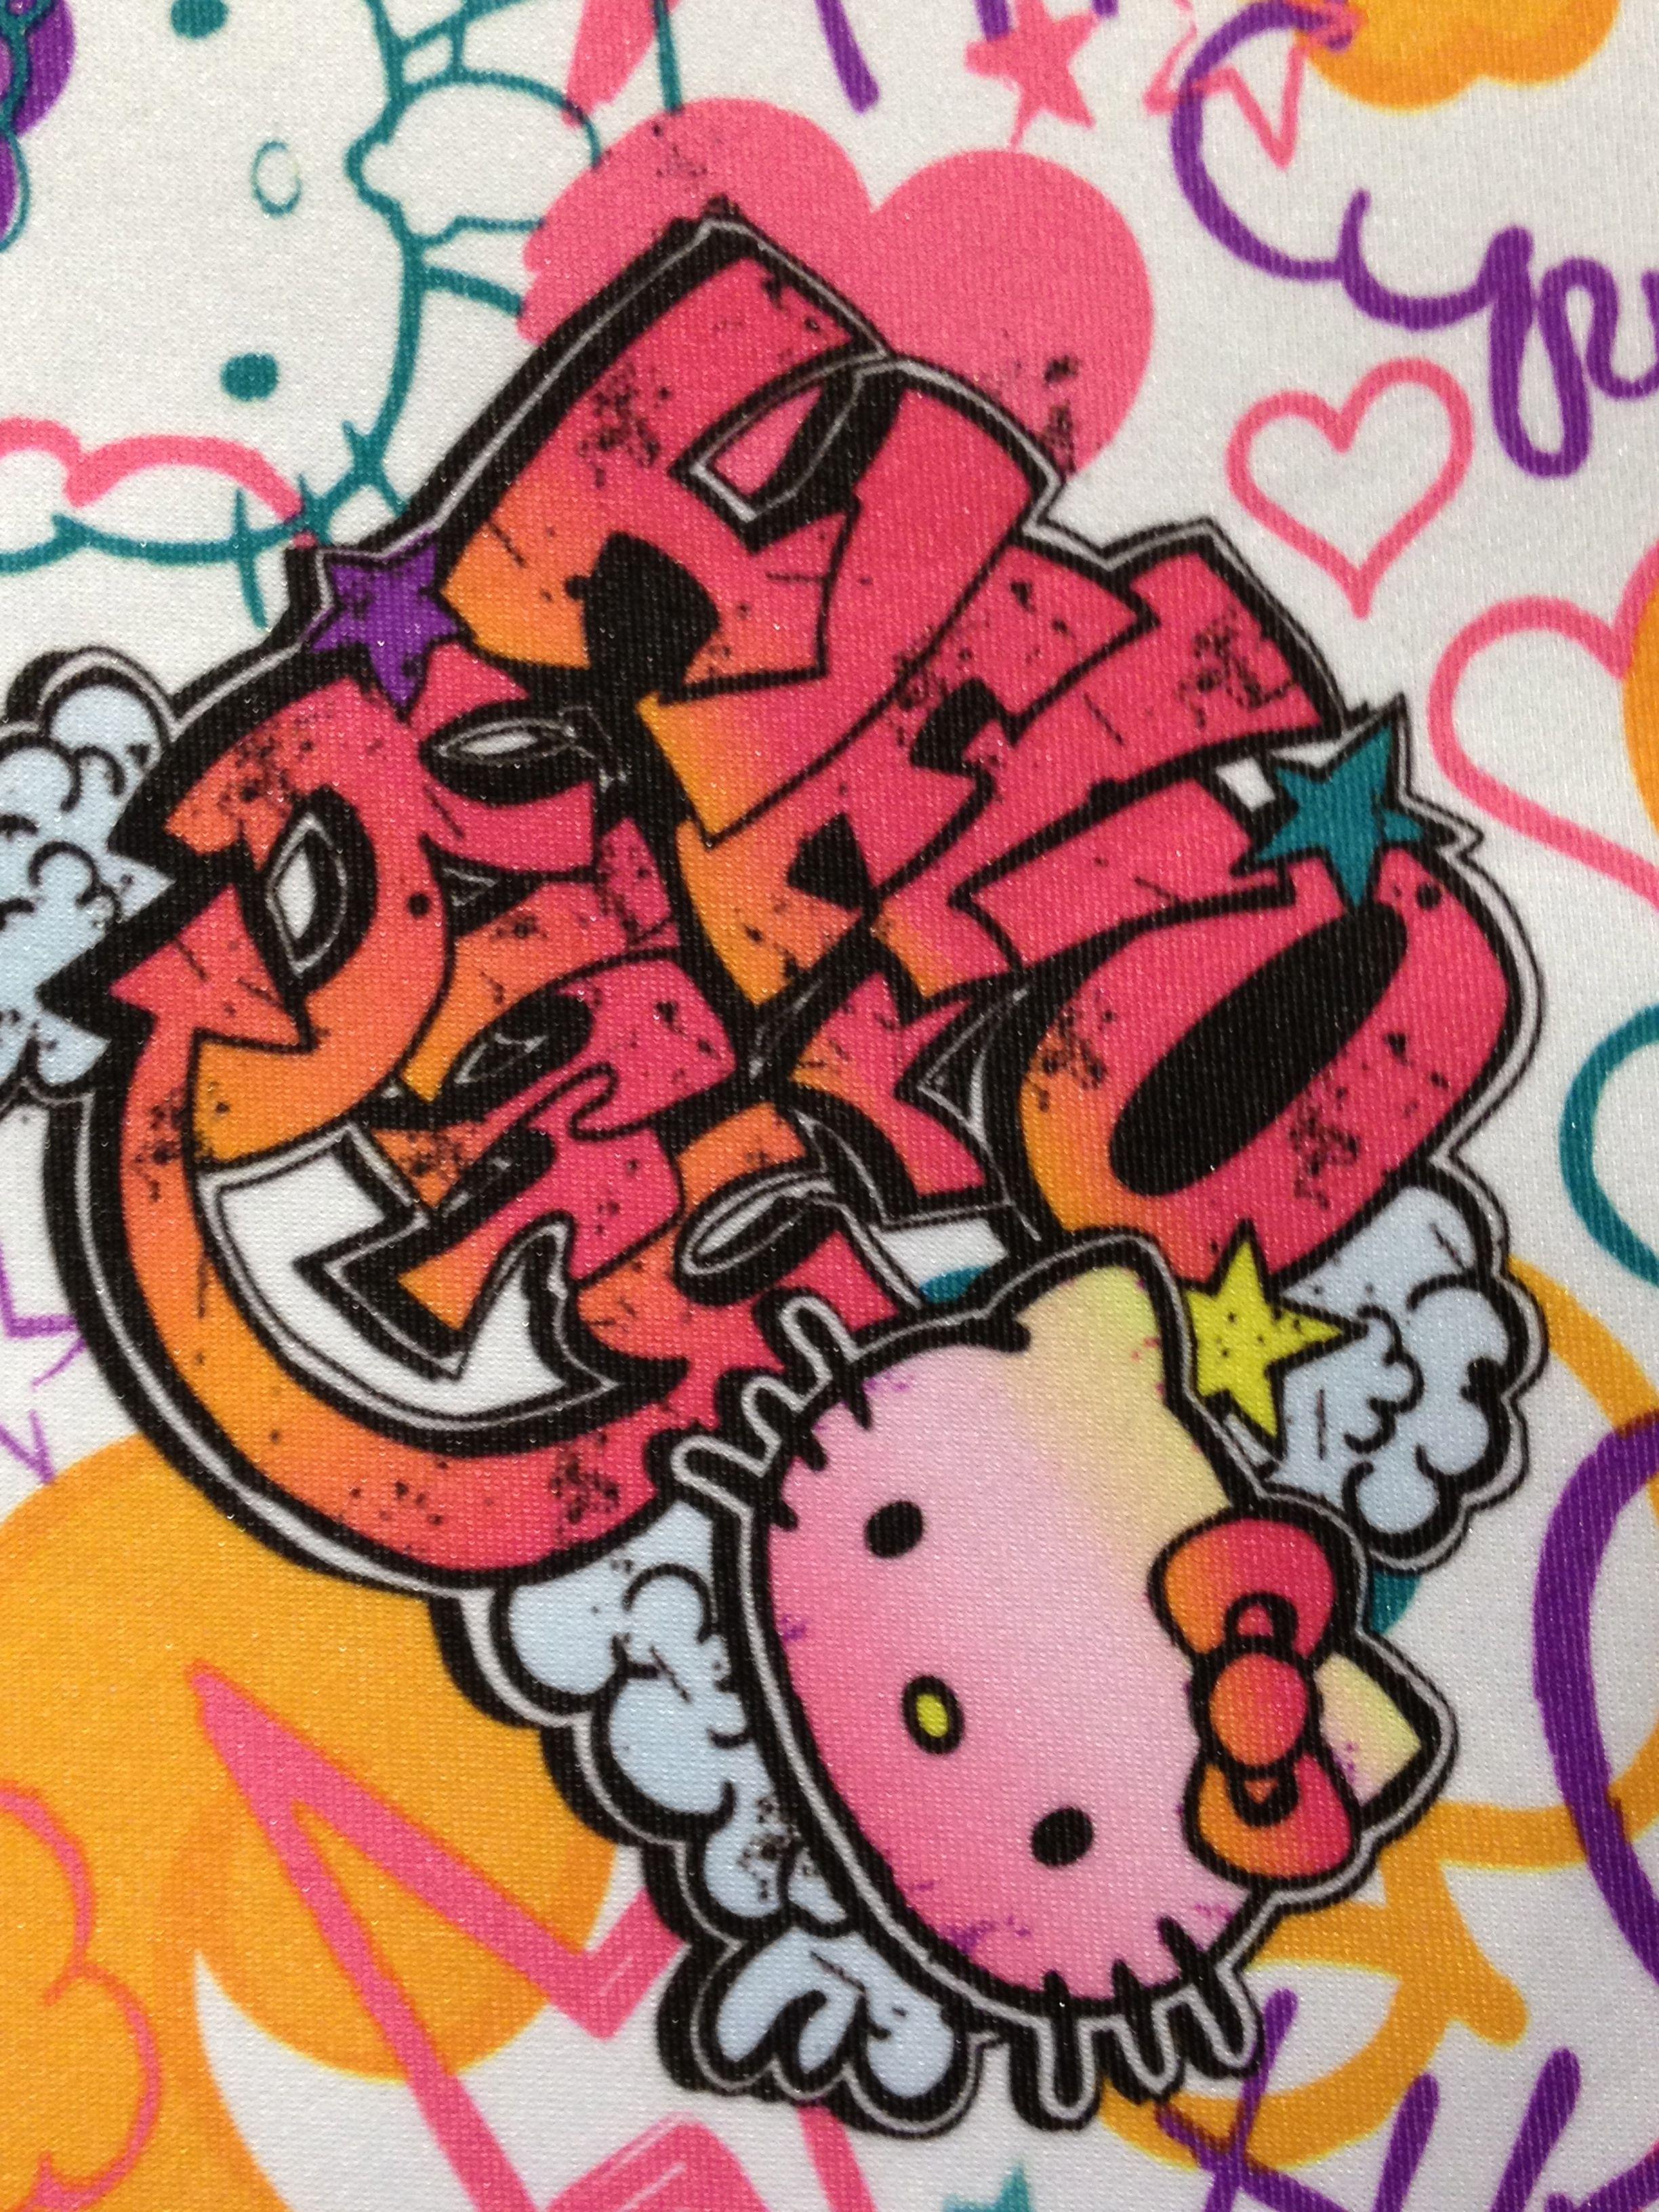 Unduh 61+ Gambar Hello Kitty Graffiti Paling Bagus Gratis